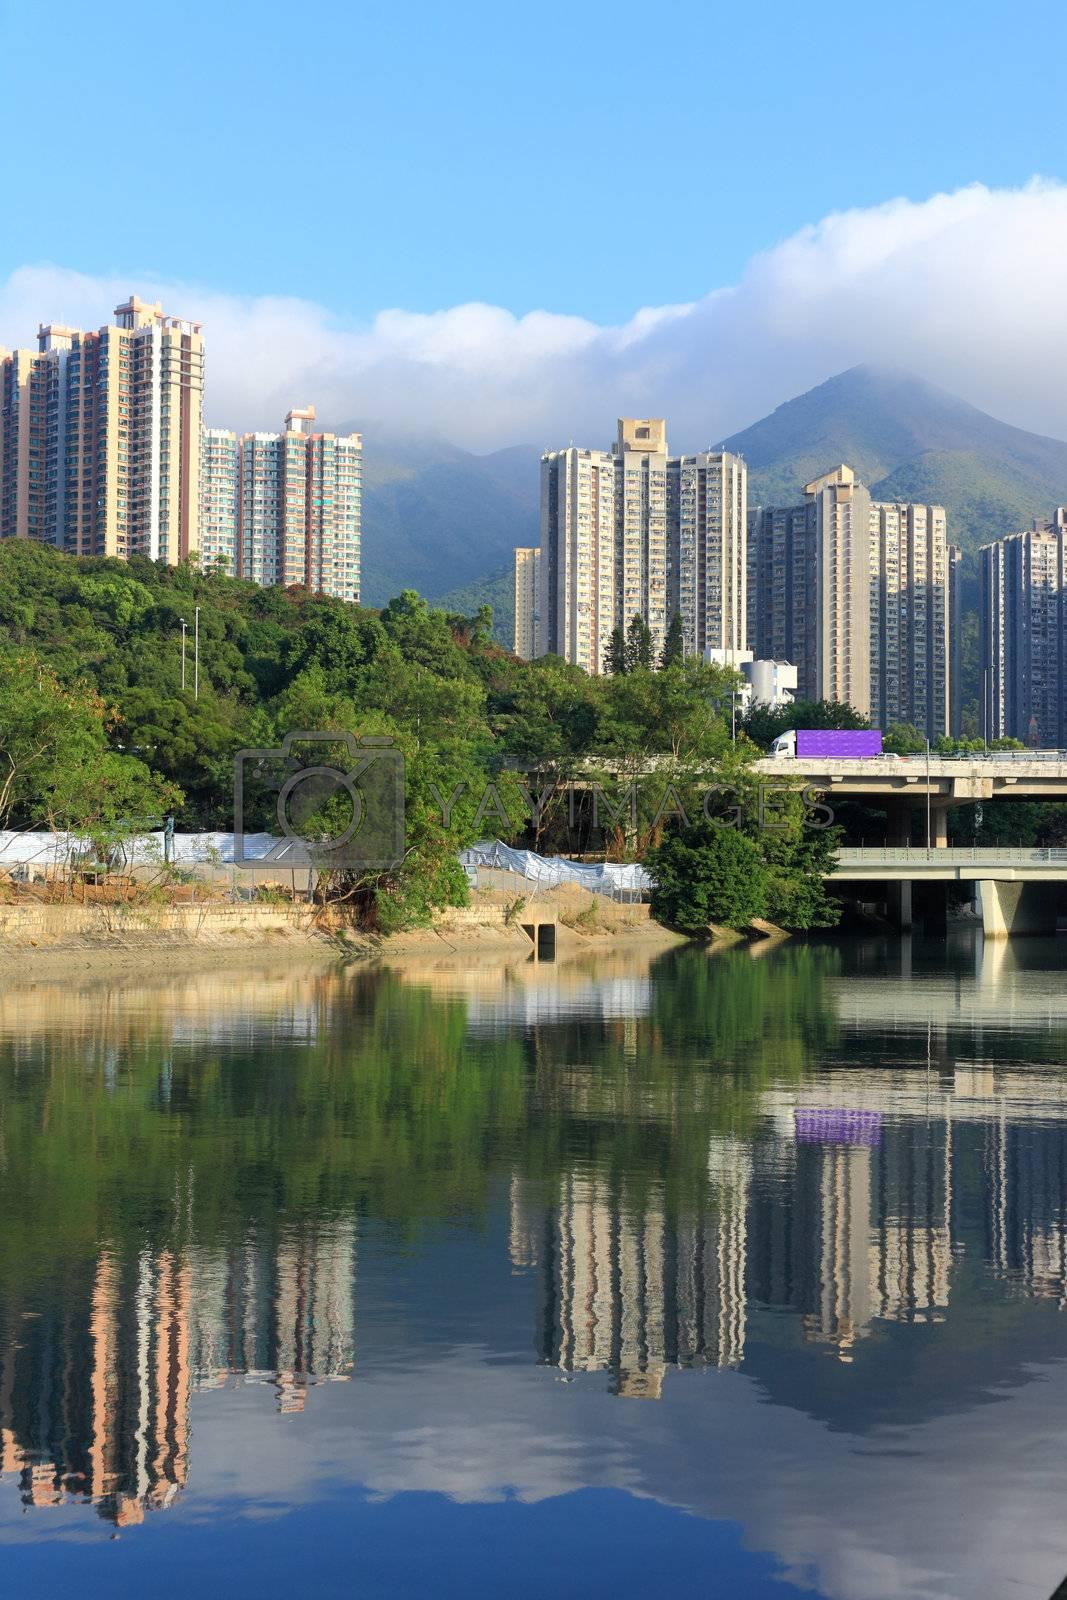 hong kong pubilc housing and river by leungchopan